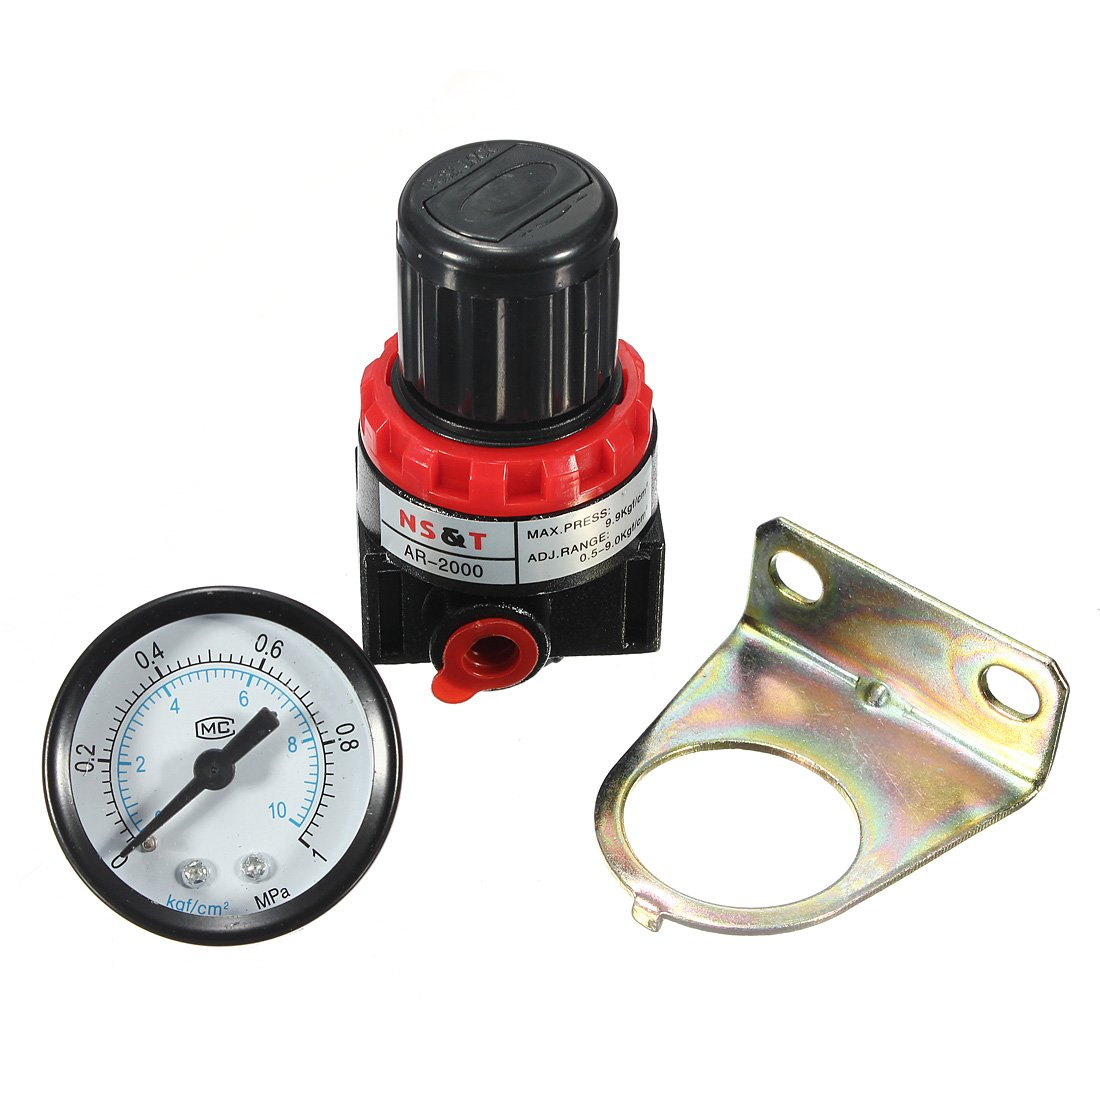 AR2000 Air Control Compressor Pressure Relief Regulator Valve Gauge